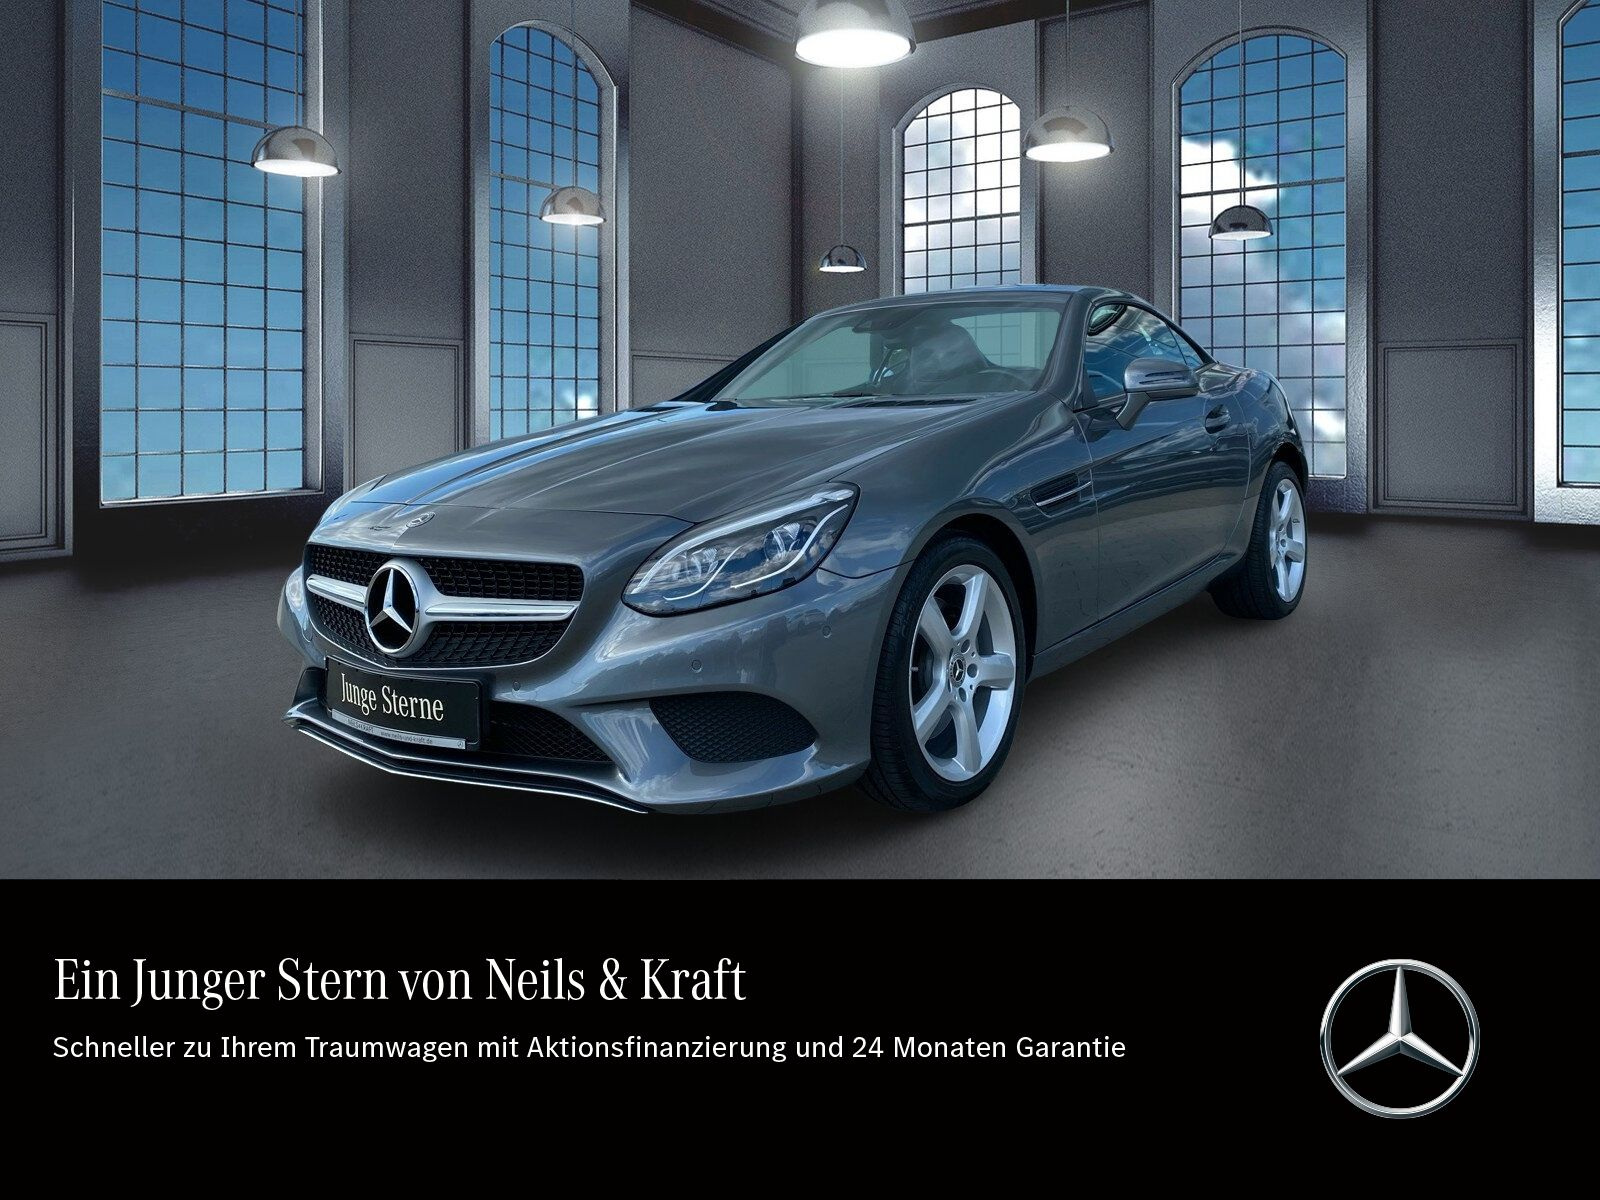 Mercedes-Benz SLC 200 CARPLAY+COMAND+LED ILS+FERNL ASS+KAMERA+, Jahr 2020, Benzin